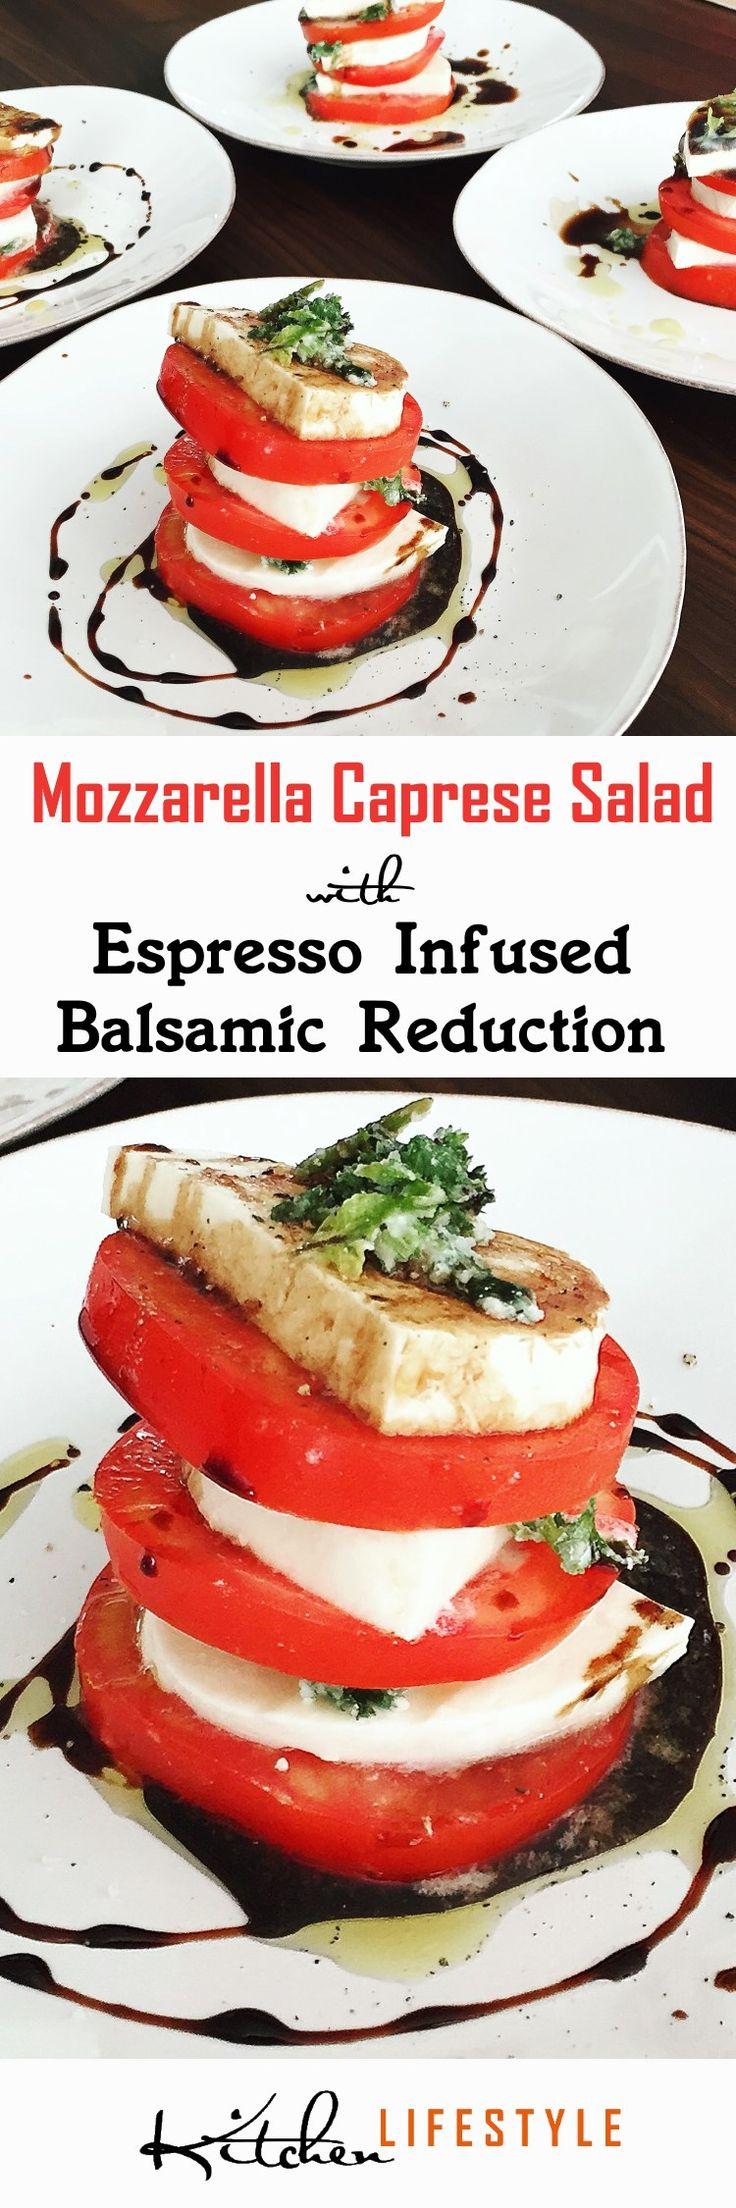 Mozzarella Caprese Salad Recipe with Espresso Infused Balsamic Reduction & Olive Oil Drizzle, Maldon Sea Salt Flakes & Black Pepper. via @KitchnLifestyle